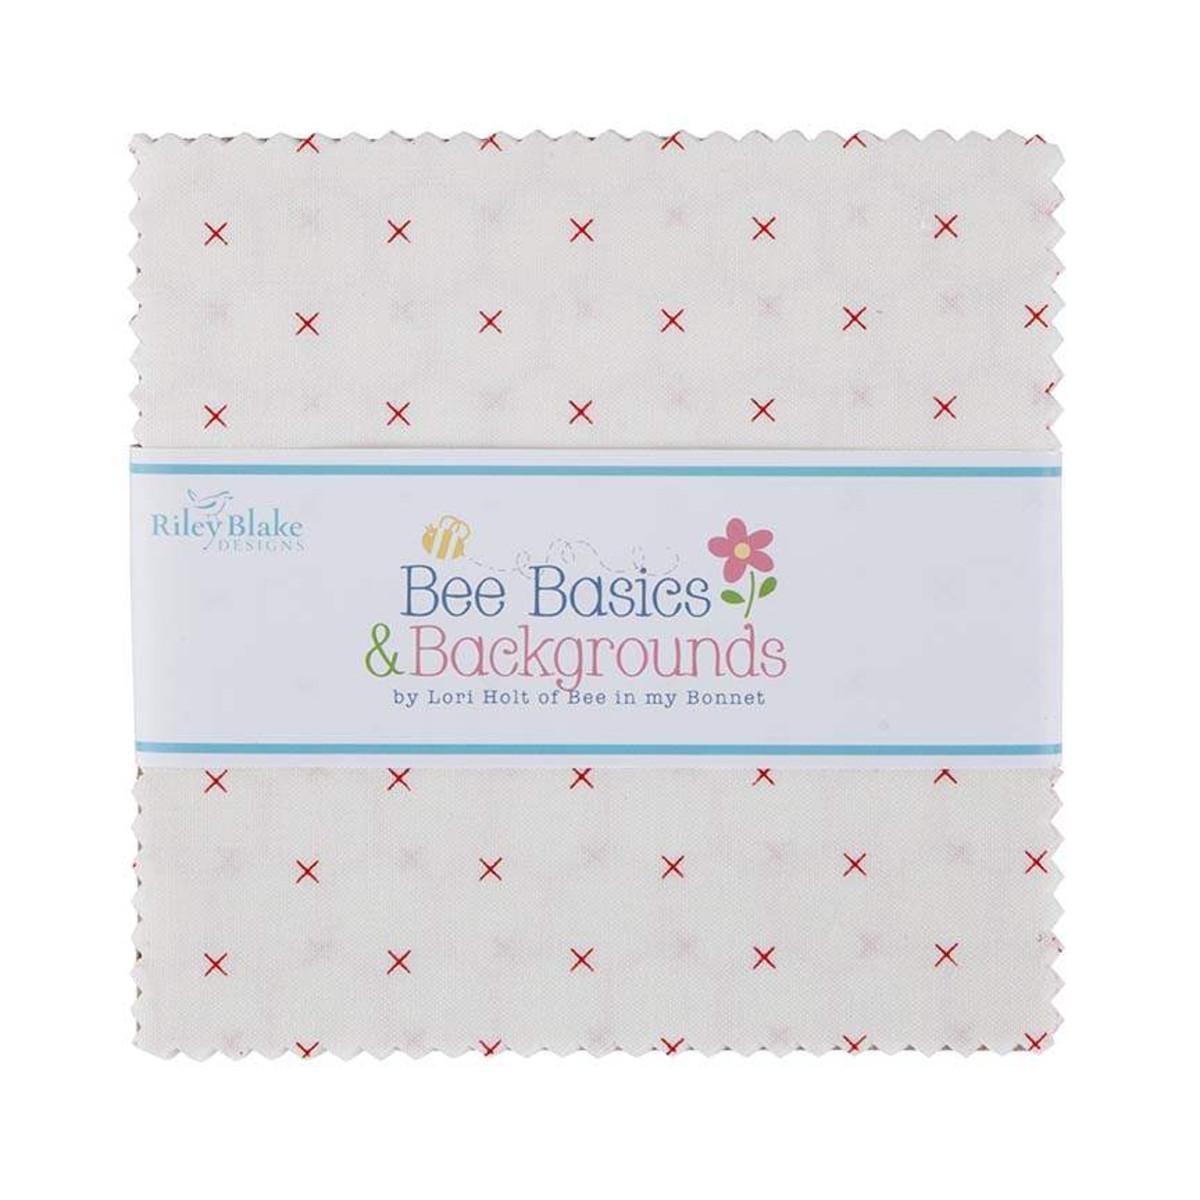 Riley Blake Charm Pack - Bee Basics WHITE by Lori Holt